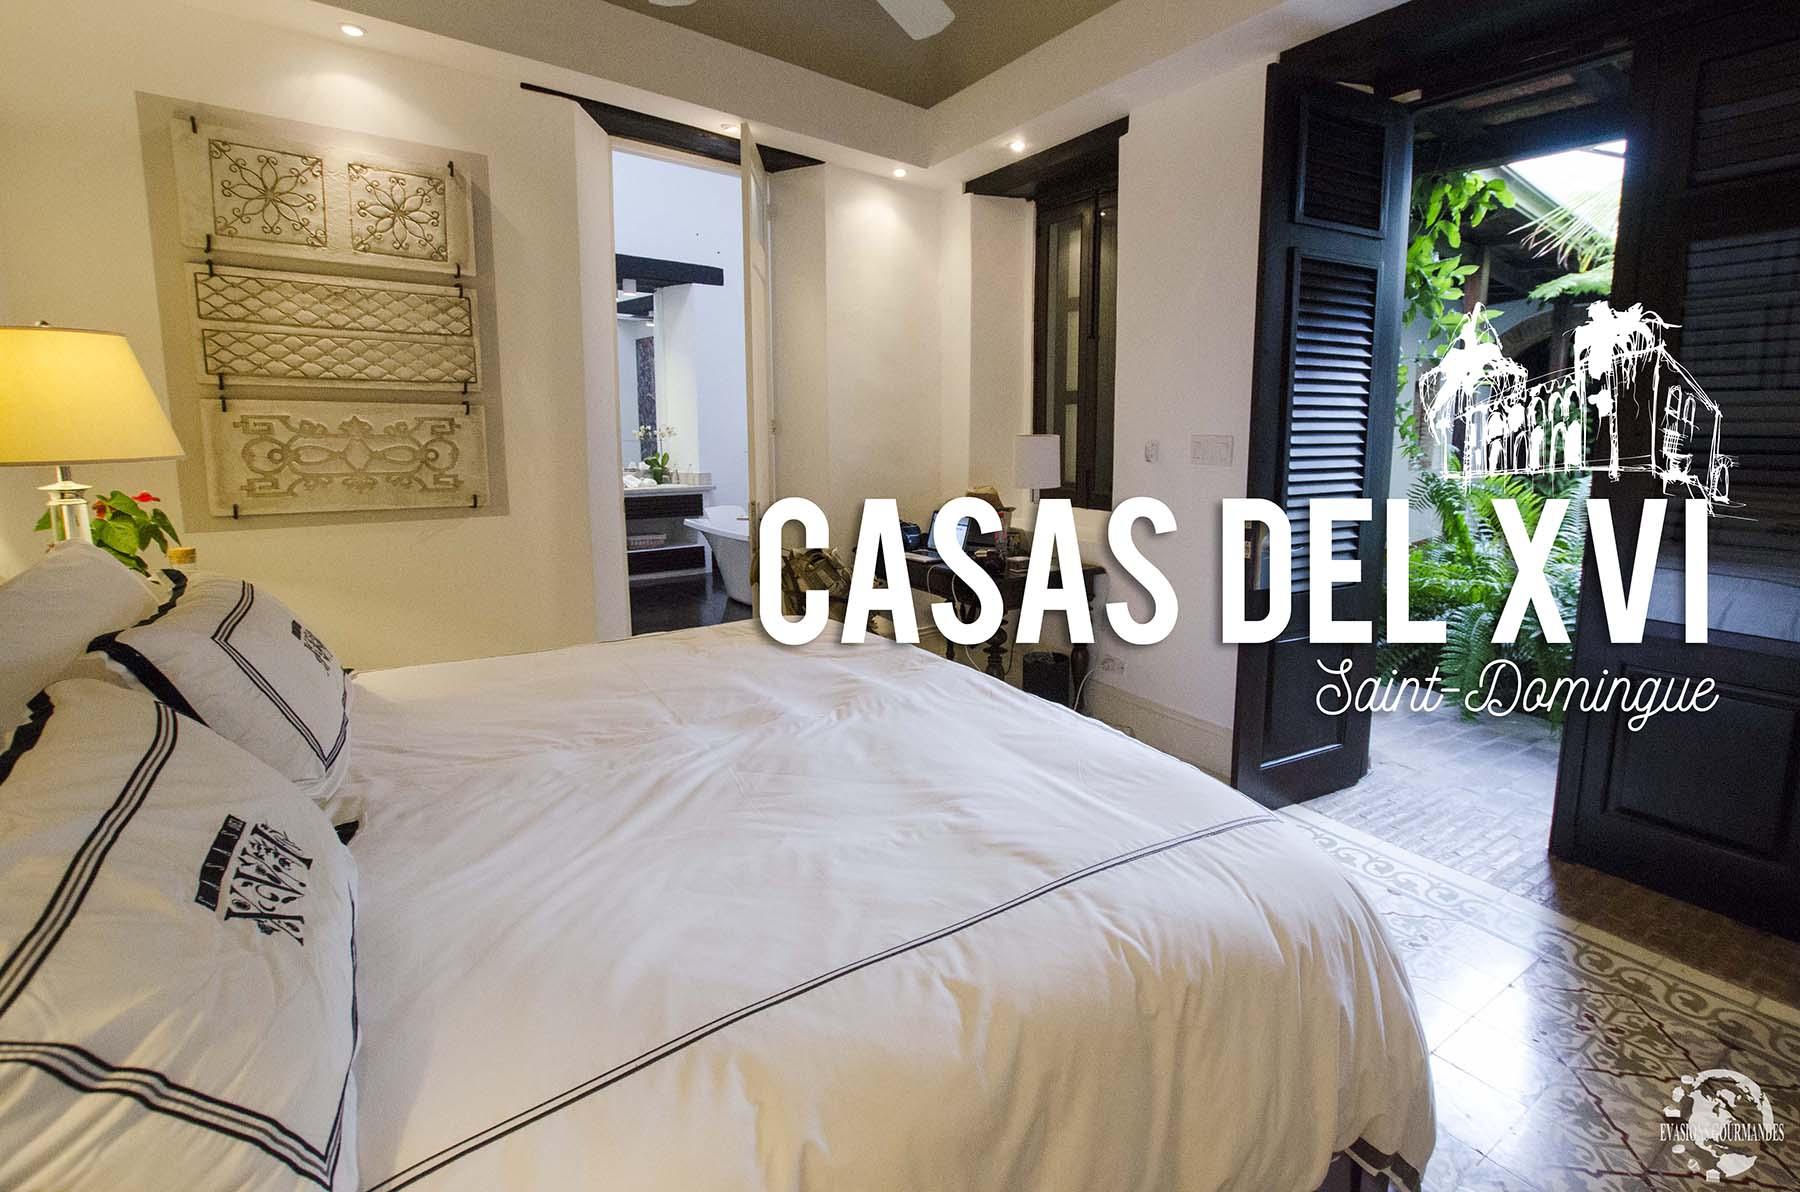 Où dormir à Saint-Domingue